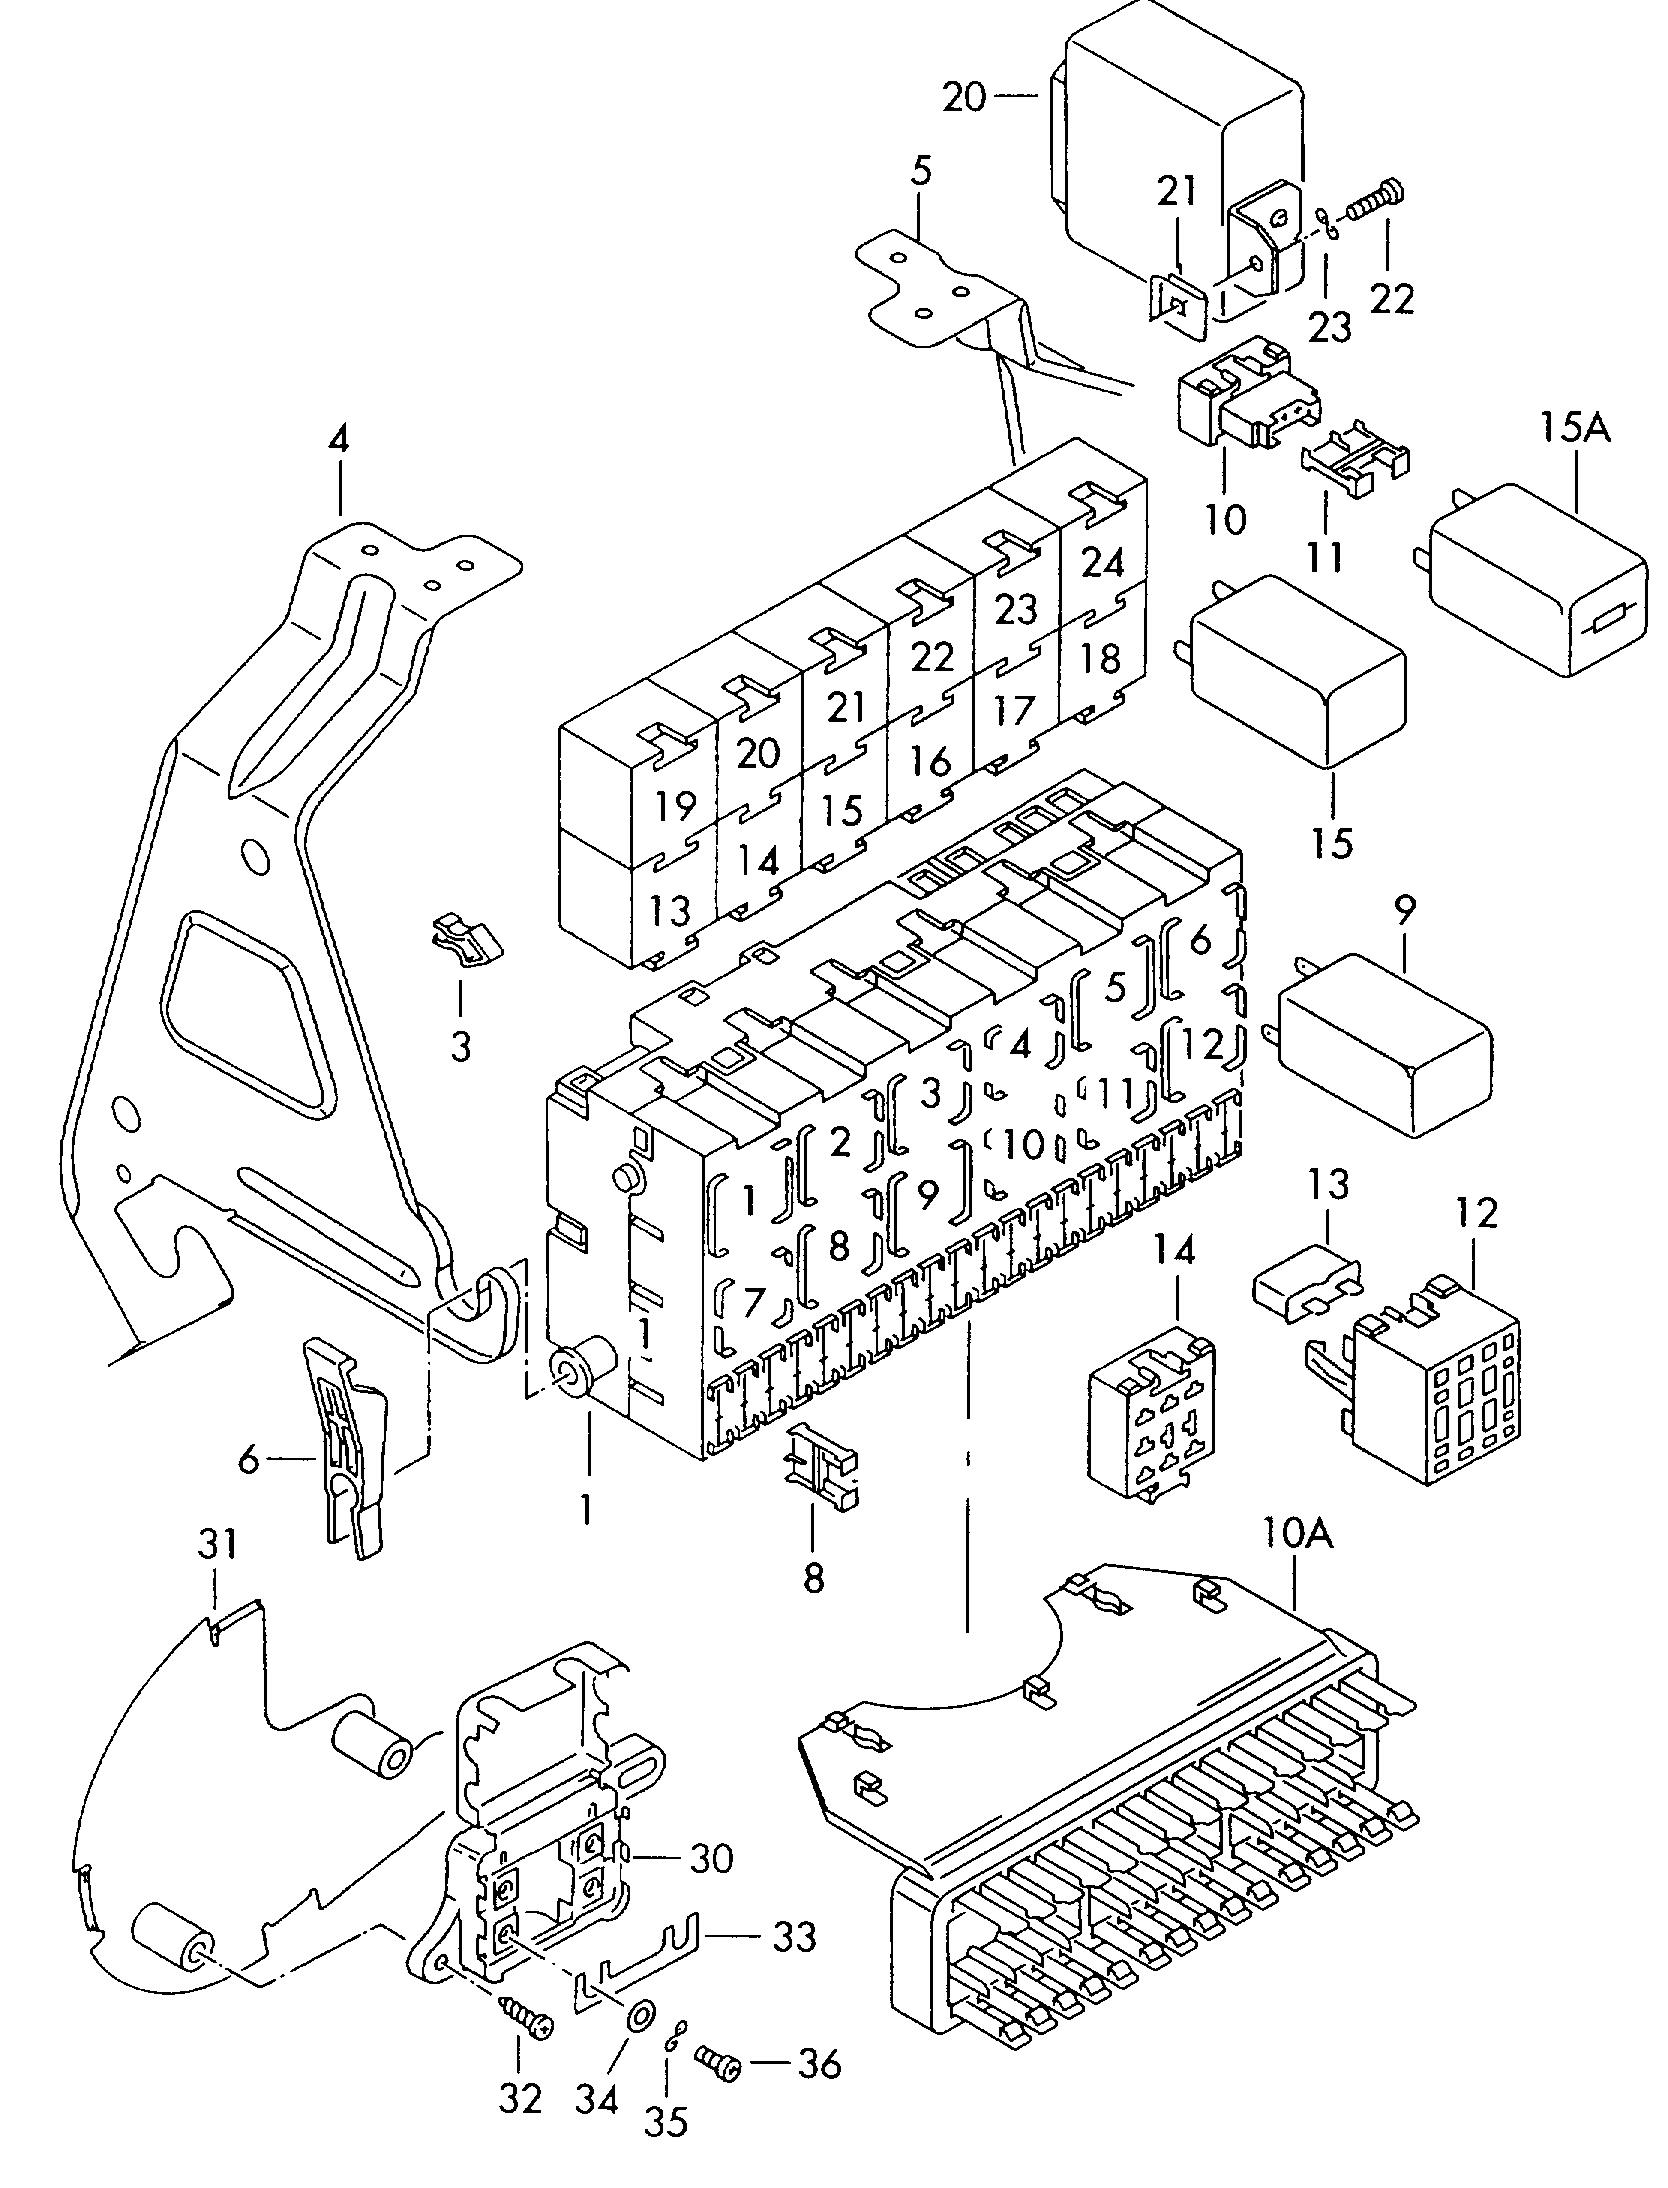 hight resolution of  diagram moreover fuse box translation furthermore 2002 volkswagen eurovan 1995 1995 vag etka